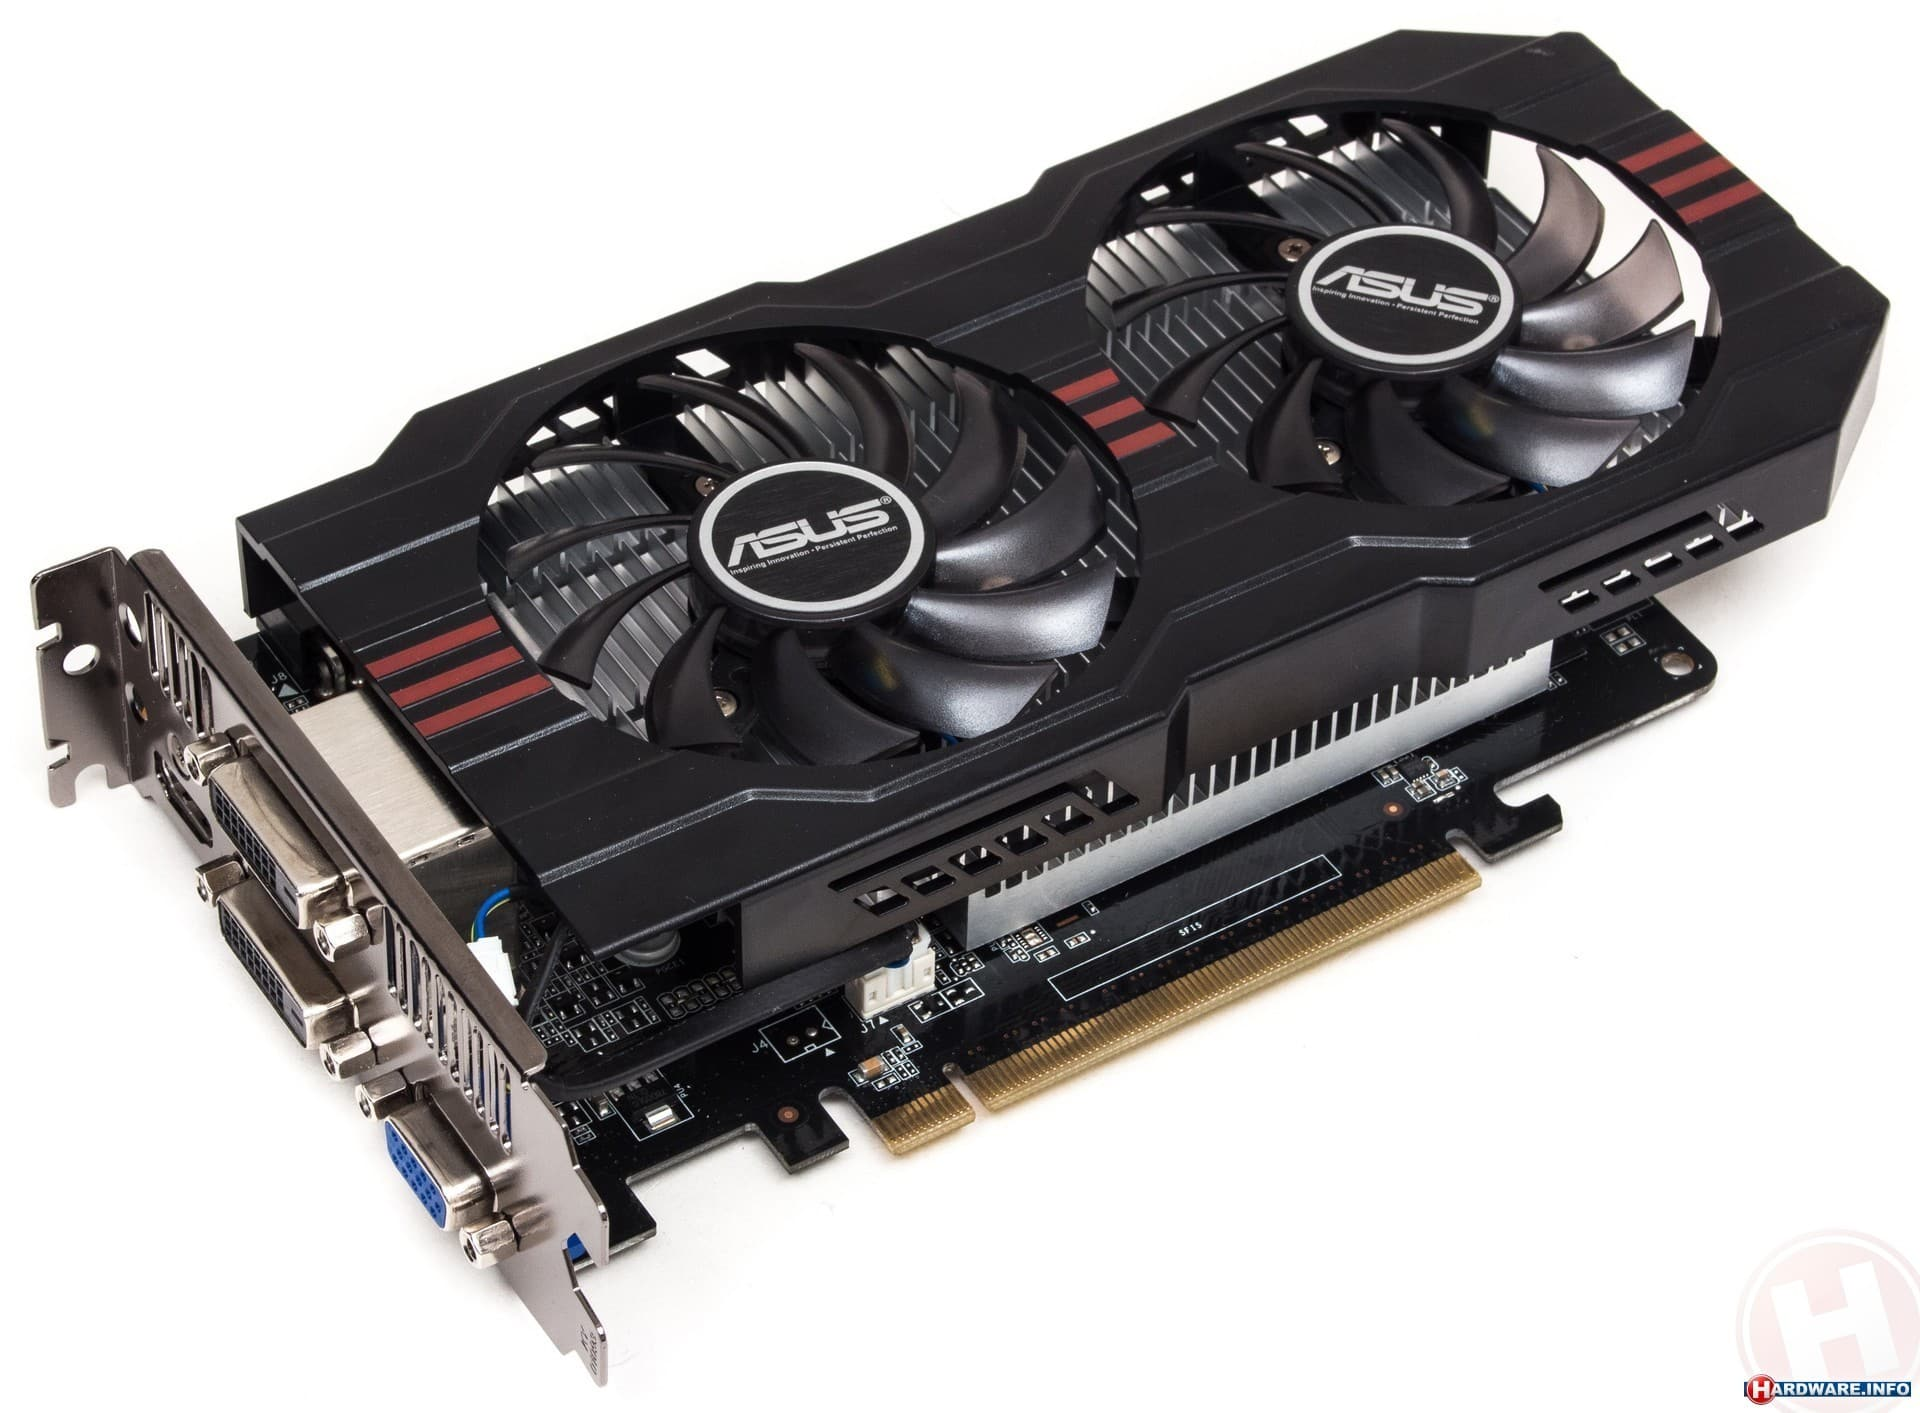 Asus GeForce GTX 750 Ti 2GB OC Edition $95 AC AR